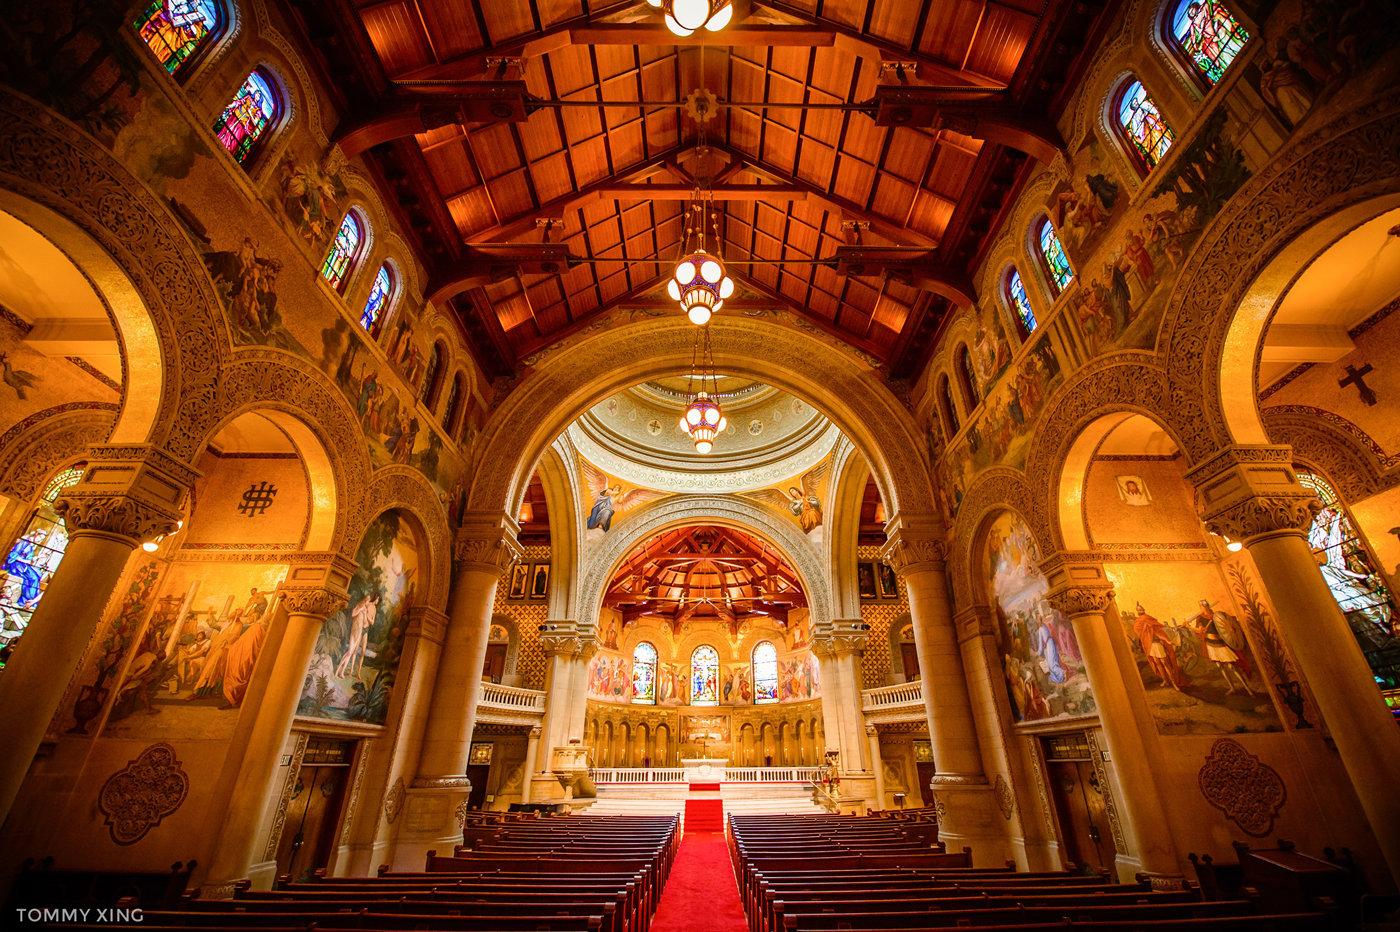 STANFORD MEMORIAL CHURCH WEDDING - Wenjie & Chengcheng - SAN FRANCISCO BAY AREA 斯坦福教堂婚礼跟拍 - 洛杉矶婚礼婚纱照摄影师 Tommy Xing Photography047.jpg